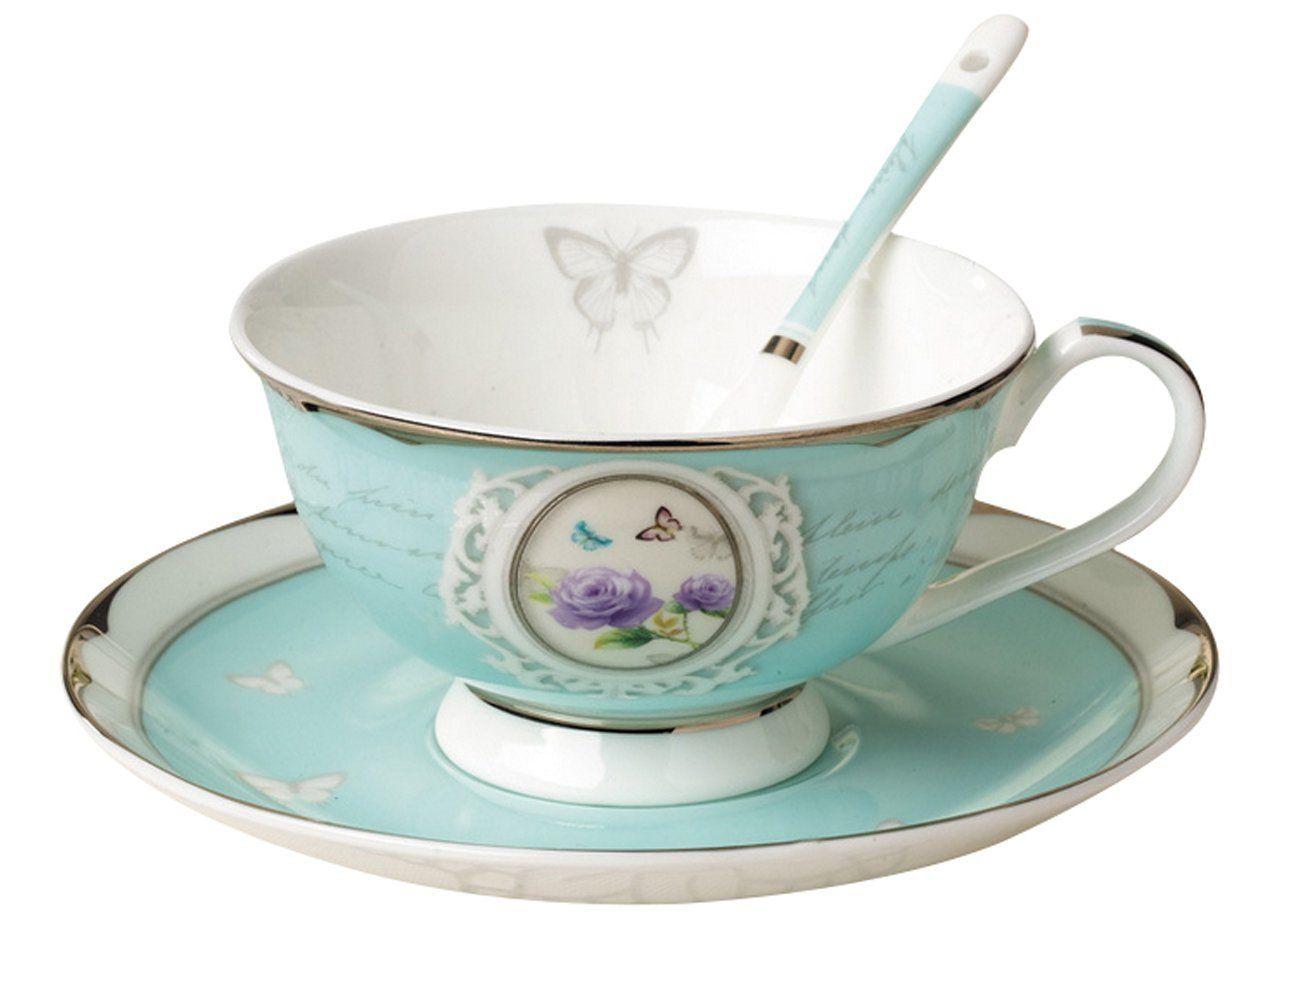 Amazon.com: Jsaron China Porcelain Blue Rose Teacup Saucer Boxed Set ...